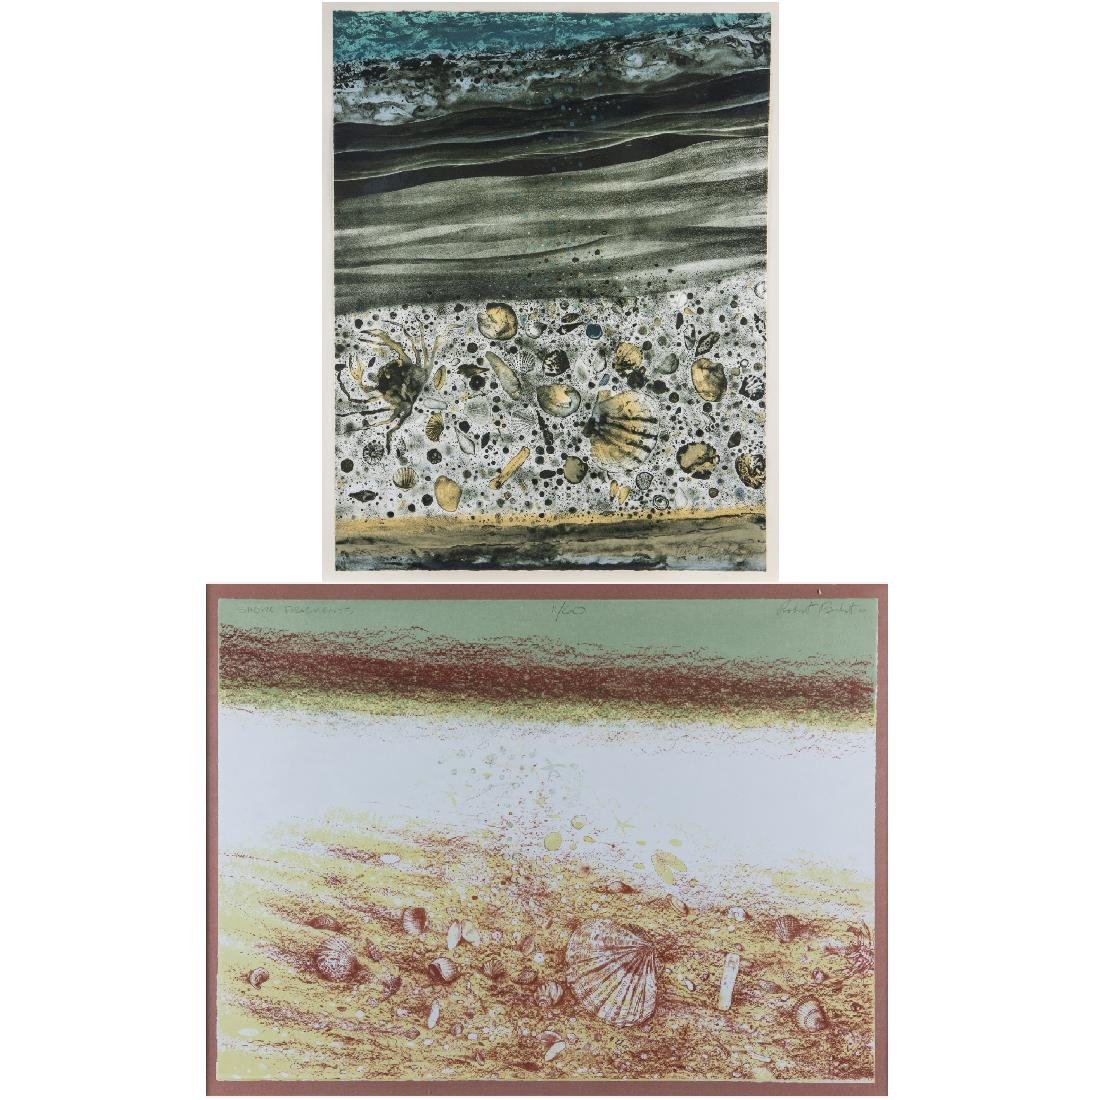 Robert Randall Burkert (b. 1930) 'Sea Edge' and 'Shore